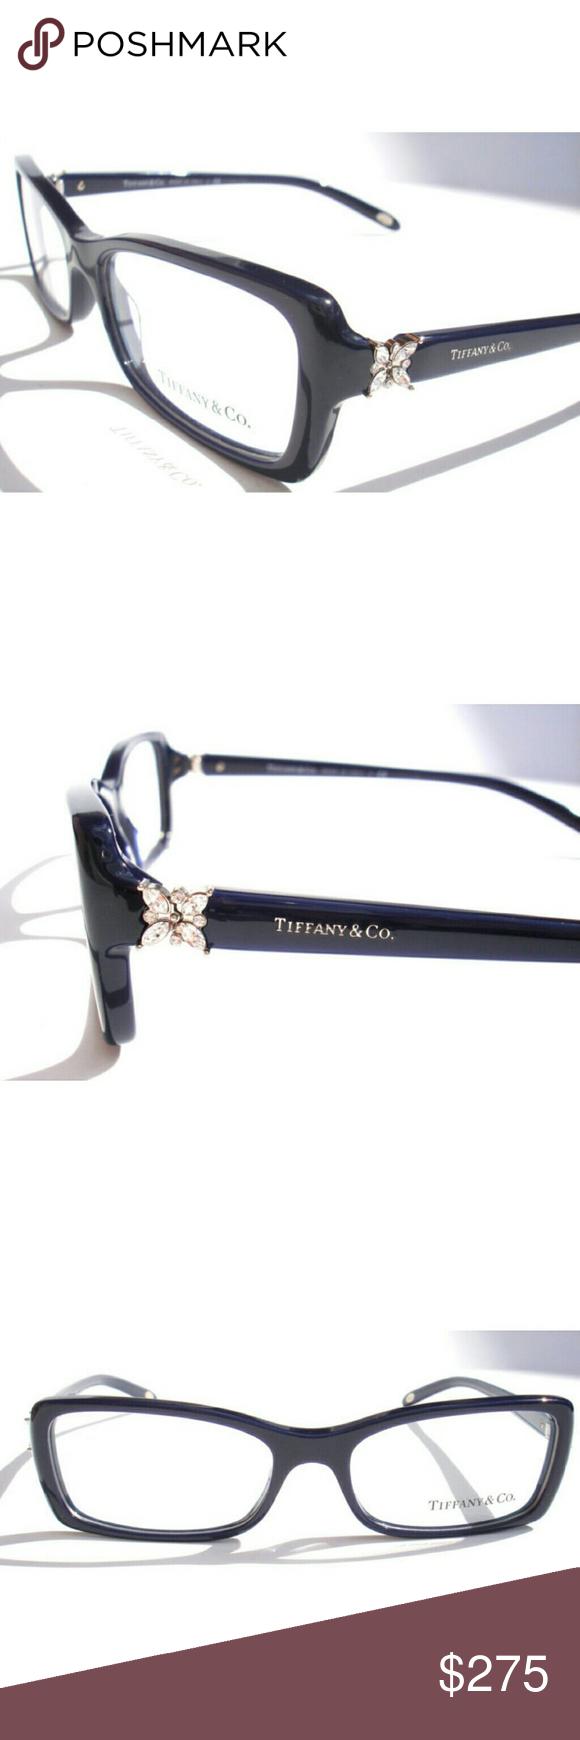 f9af6e8cbda8 Tiffany   CO Eyeglasses Authentic Tiffany   Co Eyeglasses Dark blue frame  Size 53-16-140 Includes original case only Tiffany   Co. Accessories Glasses